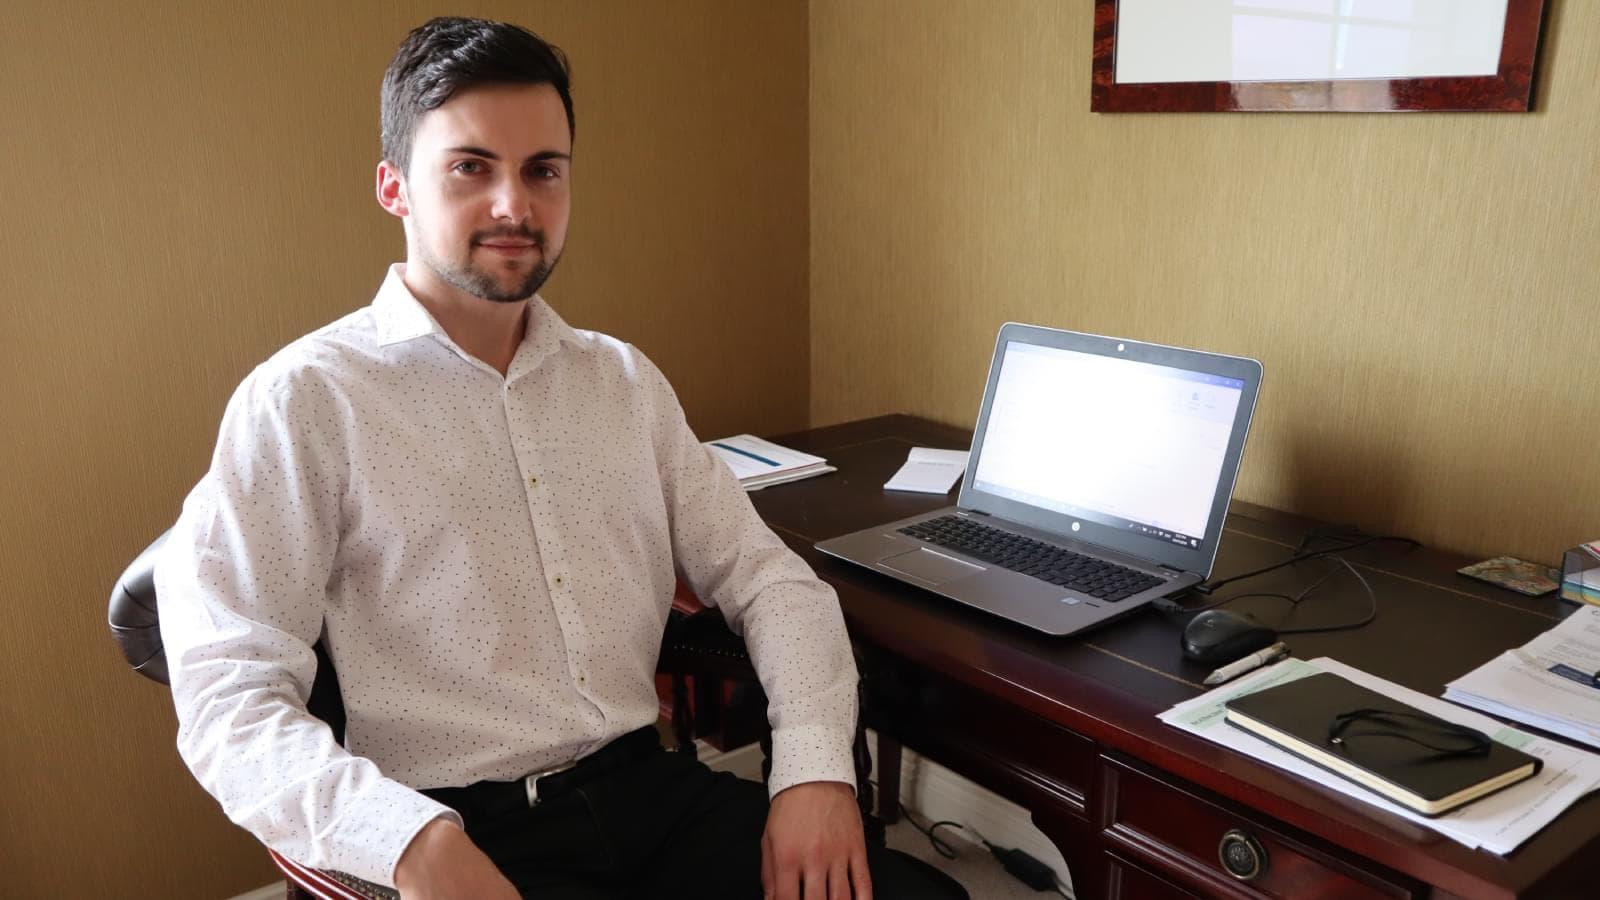 Dylan Sigley- Drop servicing blueprint review